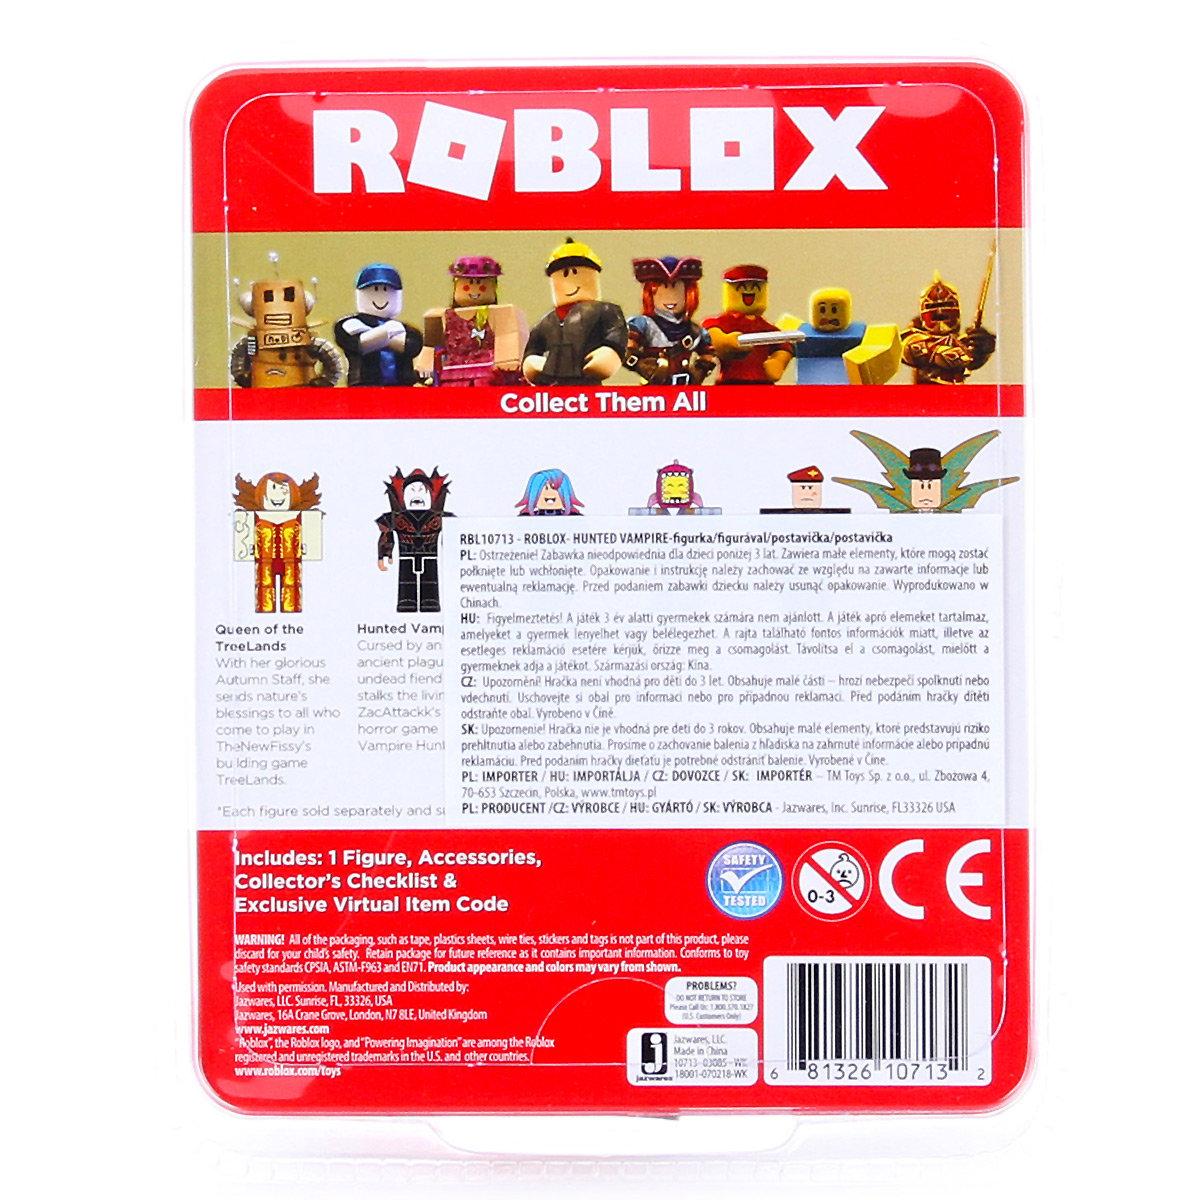 amazoncom roblox hunted vampire action figure comes Roblox Figurka Hunted Vampire Roblox Sklep Empik Com